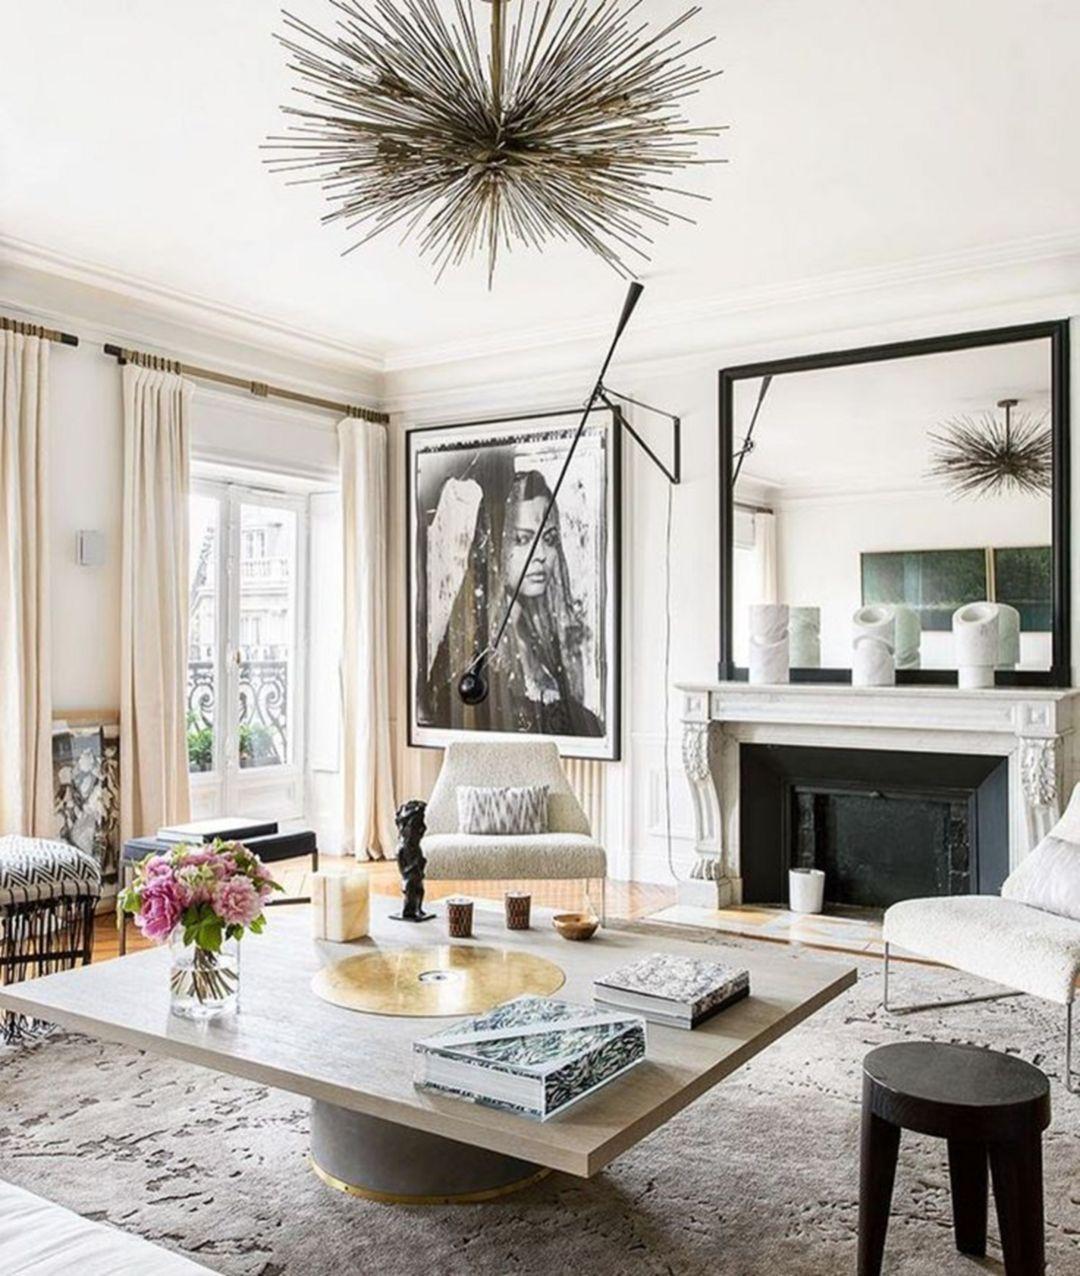 12 Beautiful Paris Style Decorating Ideas For Dream Apartments Design Decorating Chic Apartment Decor Modern French Interiors Parisian Decor